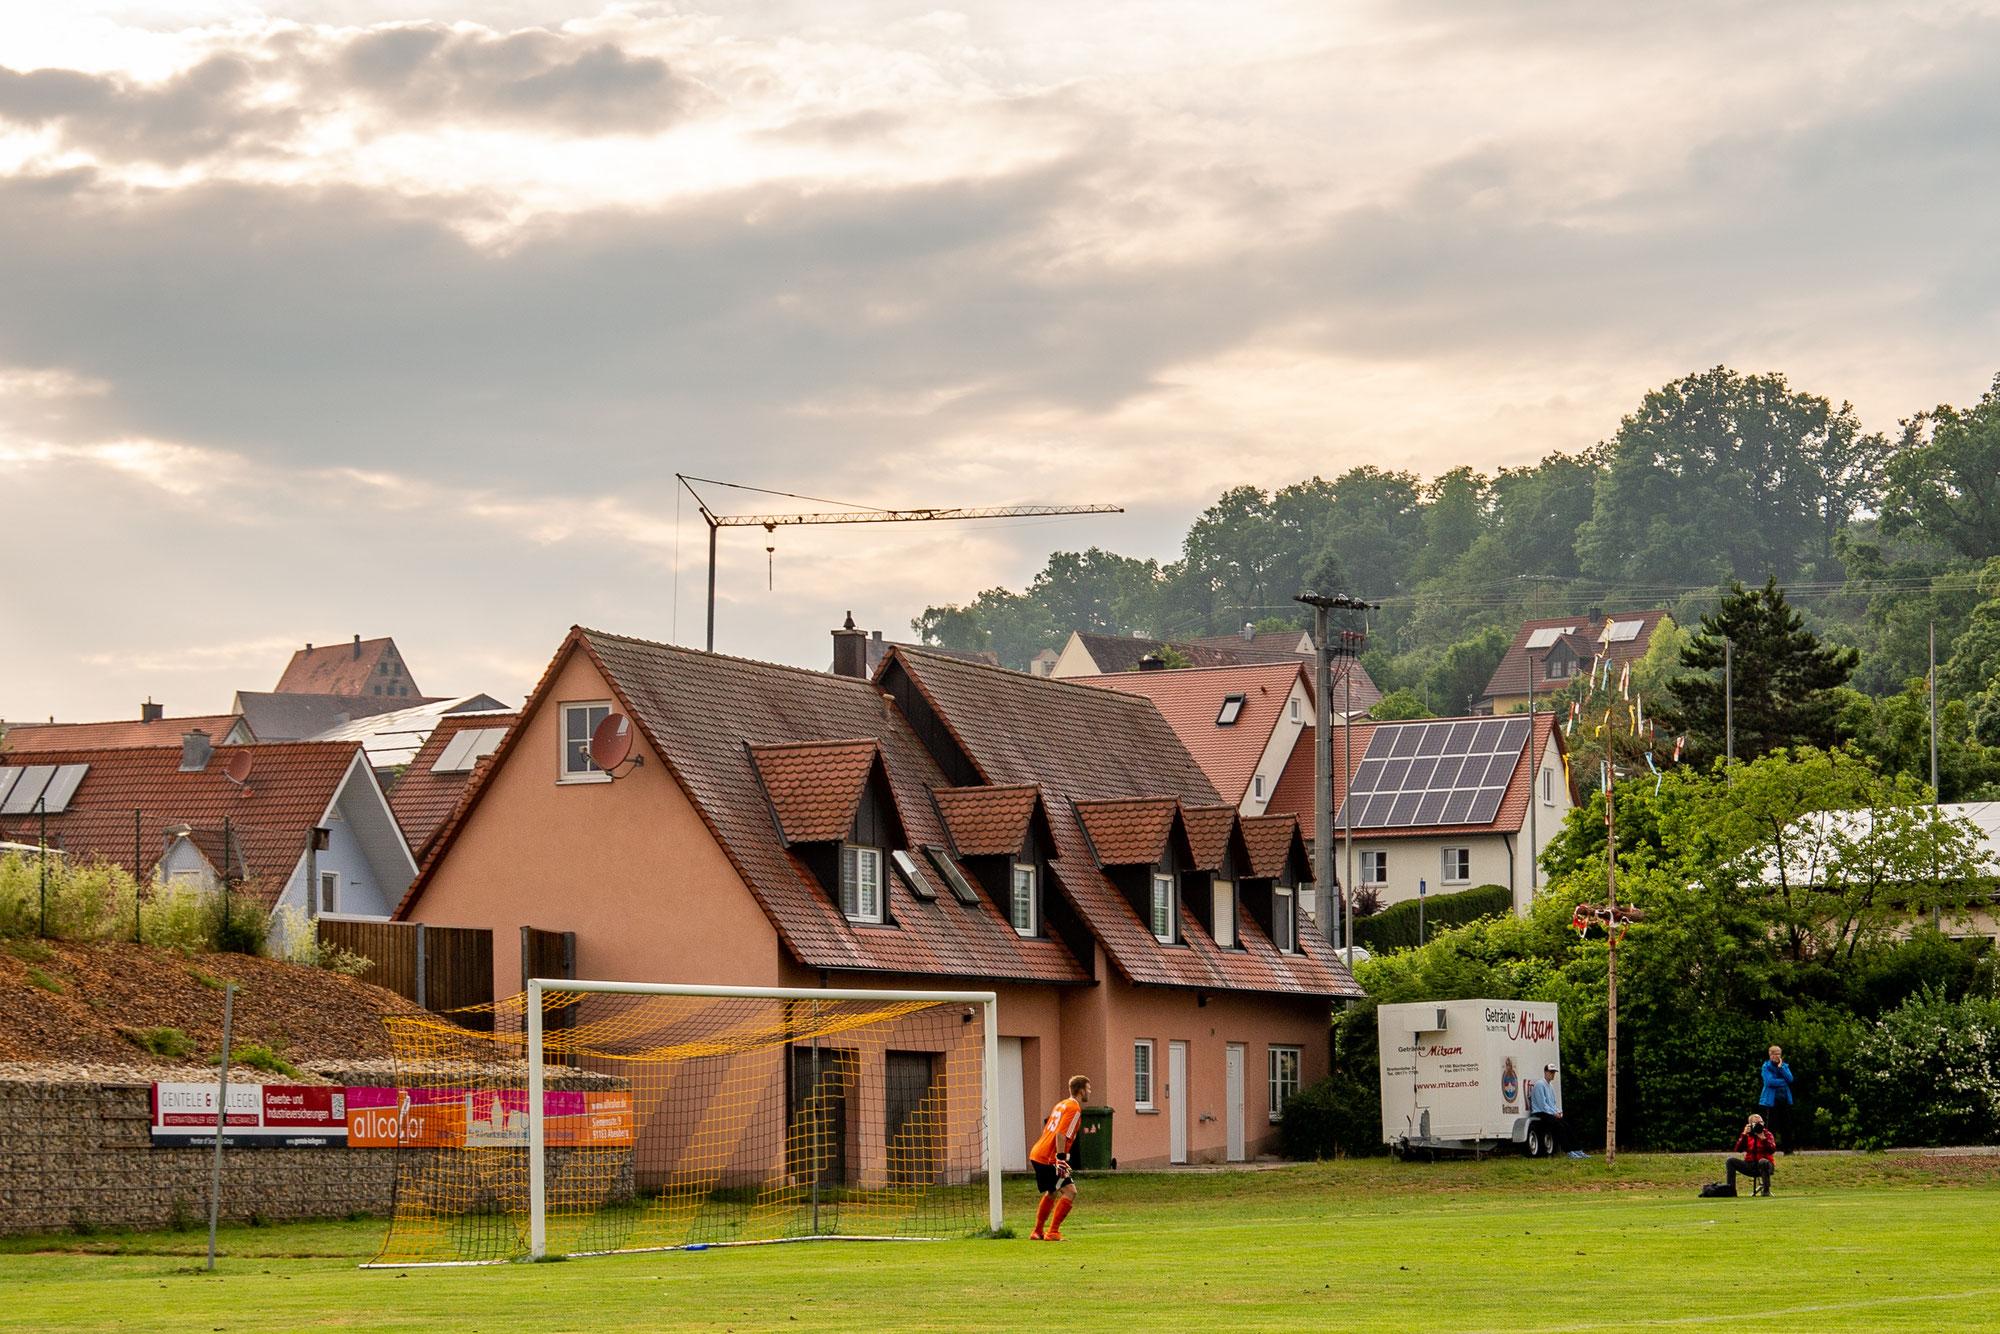 Groundhopping: SpVgg. Ansbach 09 vs. SC 04 Schwabach